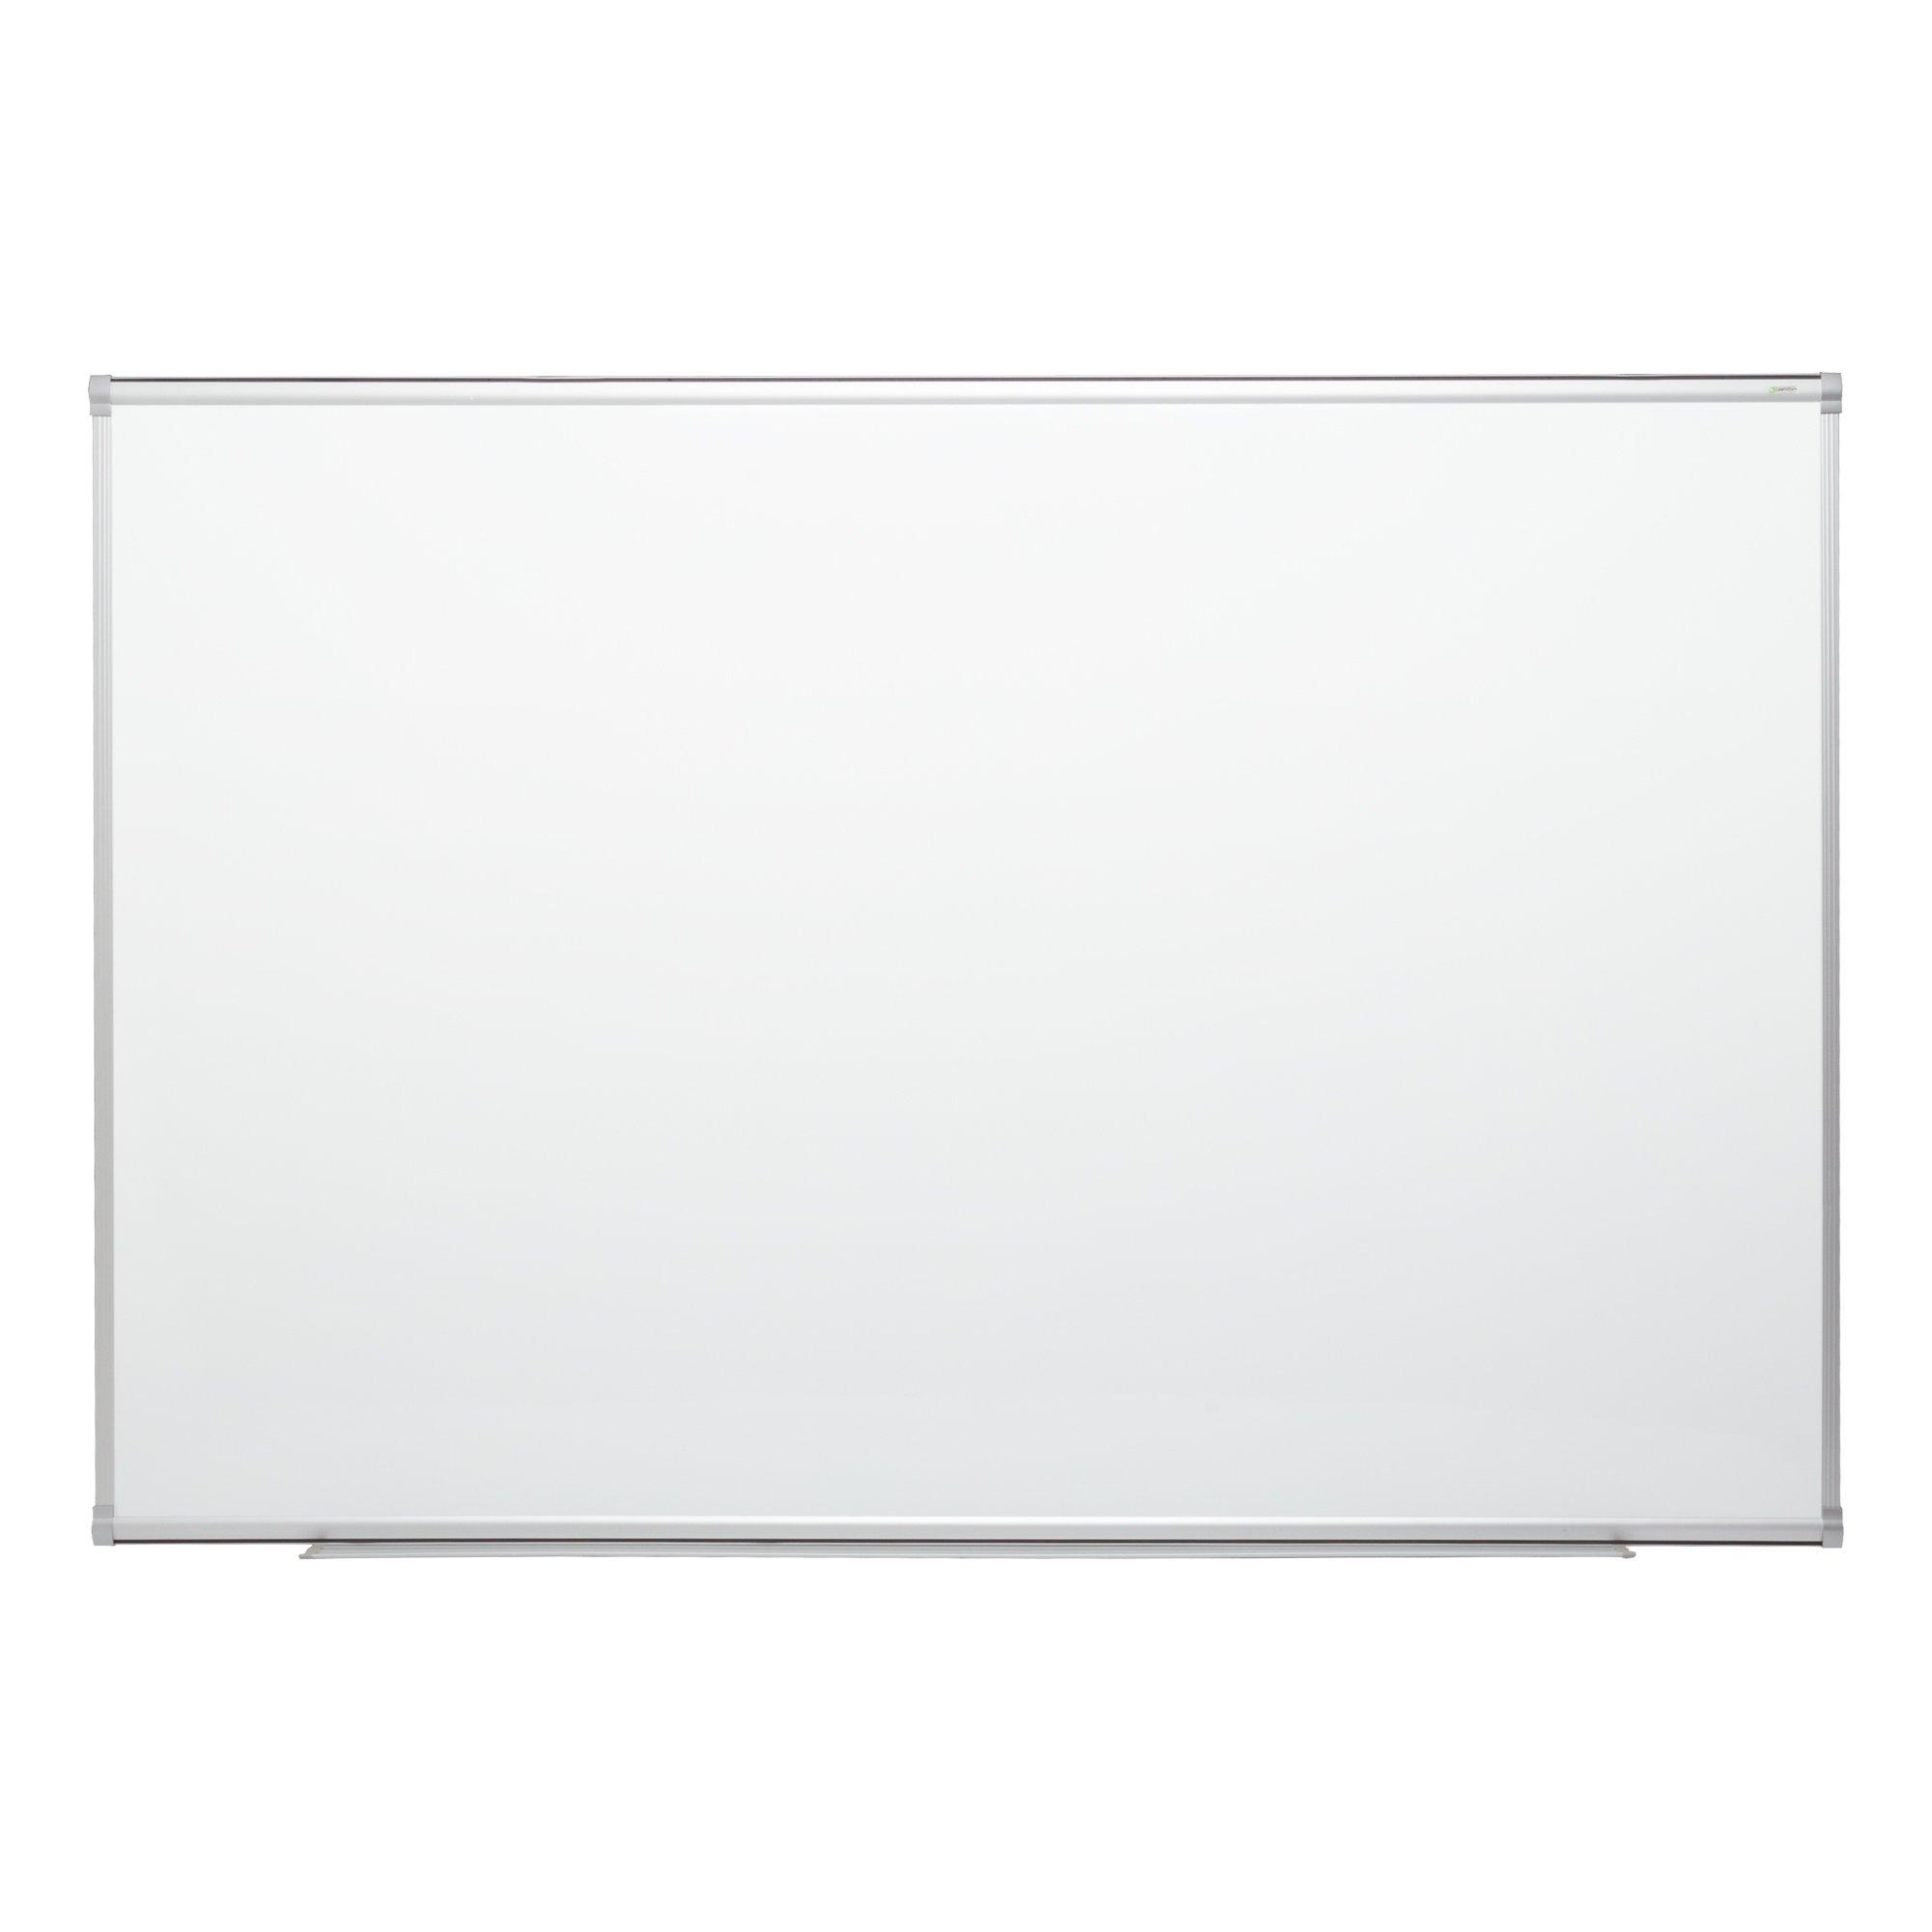 Learniture 4'x10' Porcelain Steel Magnetic Dry Erase Board w/Aluminum Frame & Map Rail 829-SO